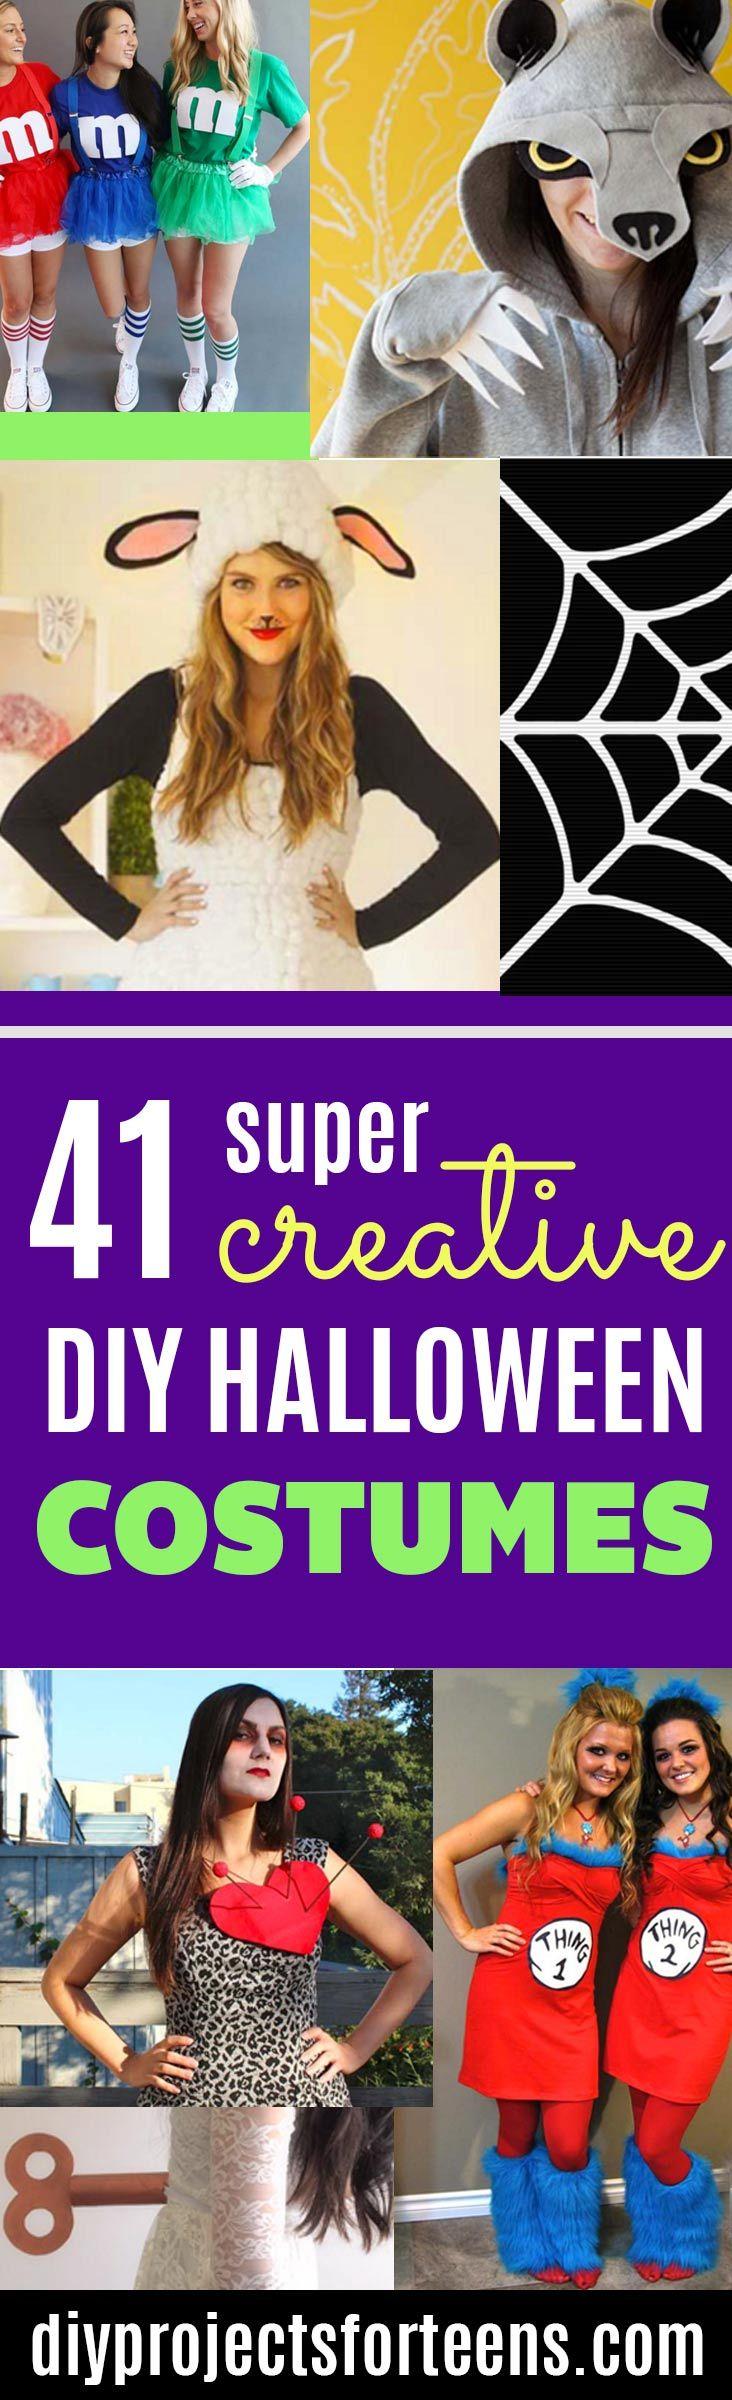 diy costumes homemade halloween costumes and kid halloween costumes